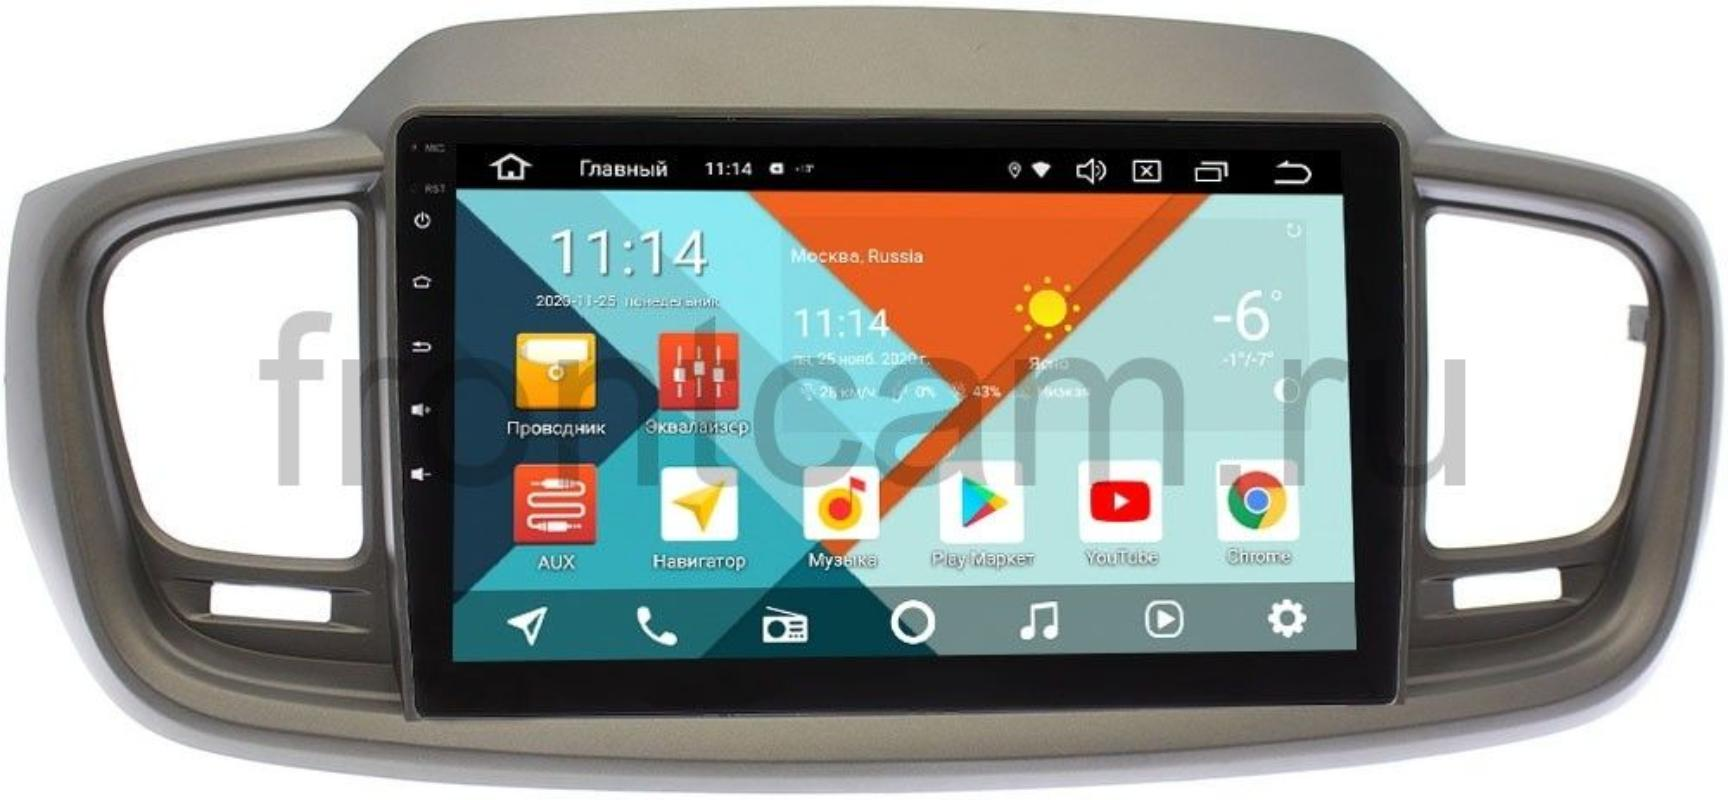 Штатная магнитола Kia Sorento III Prime 2015-2020 Wide Media KS1125QM-2/32 DSP CarPlay 4G-SIM на Android 10 (+ Камера заднего вида в подарок!)